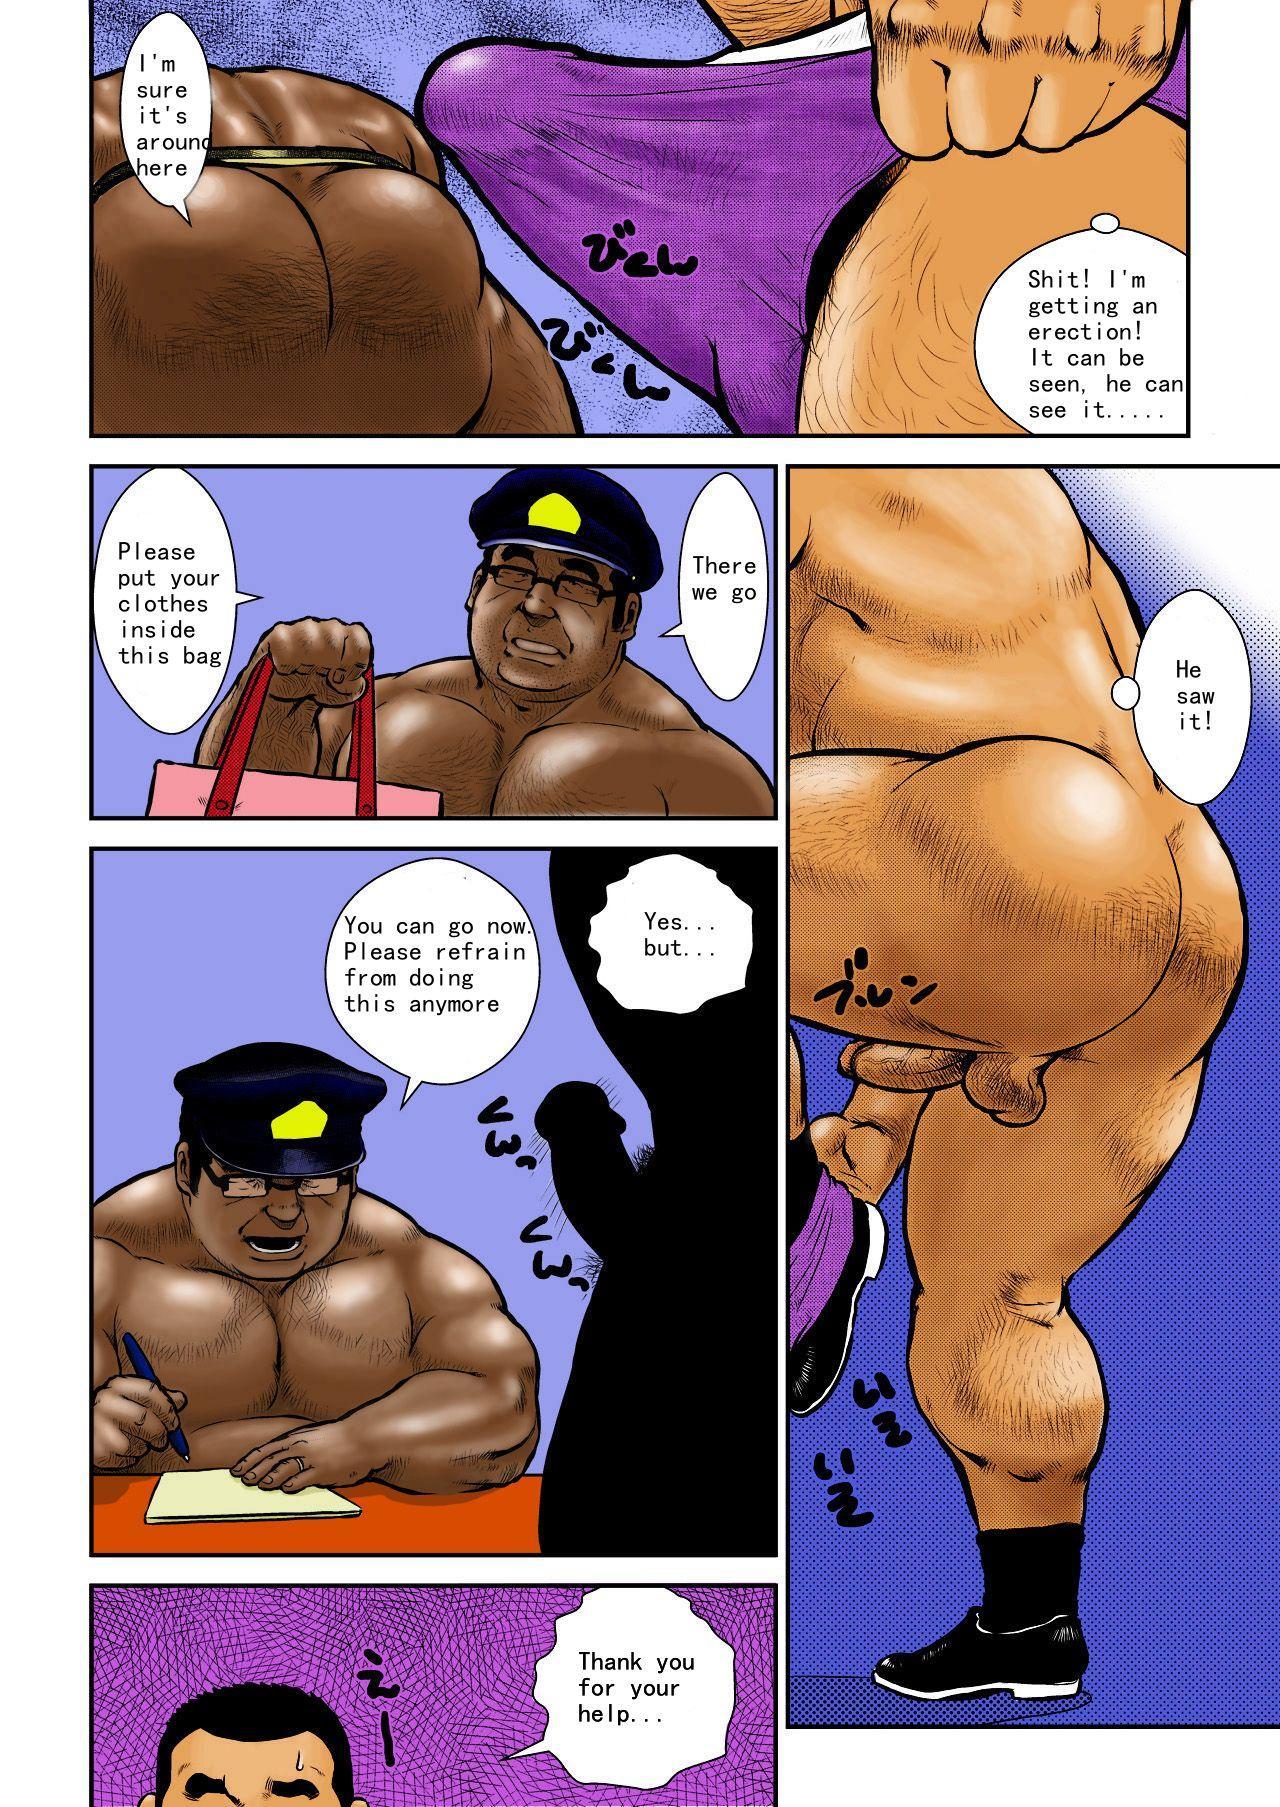 Honjitsu wa Zenra Day | Today is Naked Day 3